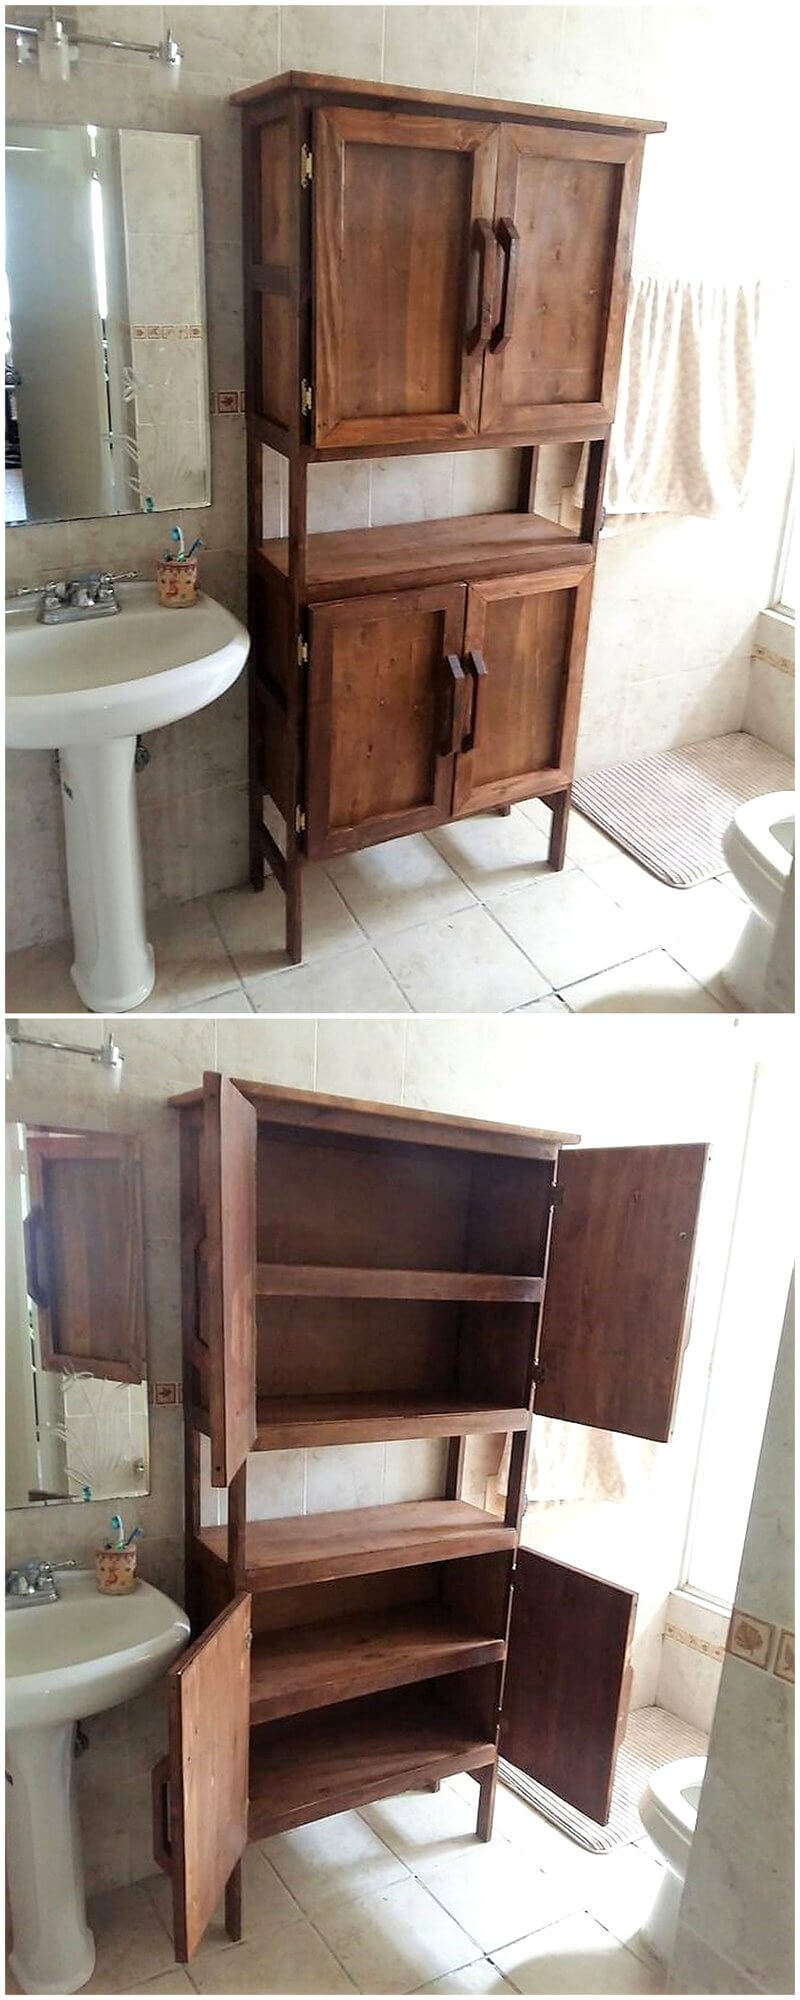 wood pallet storage for bathroom